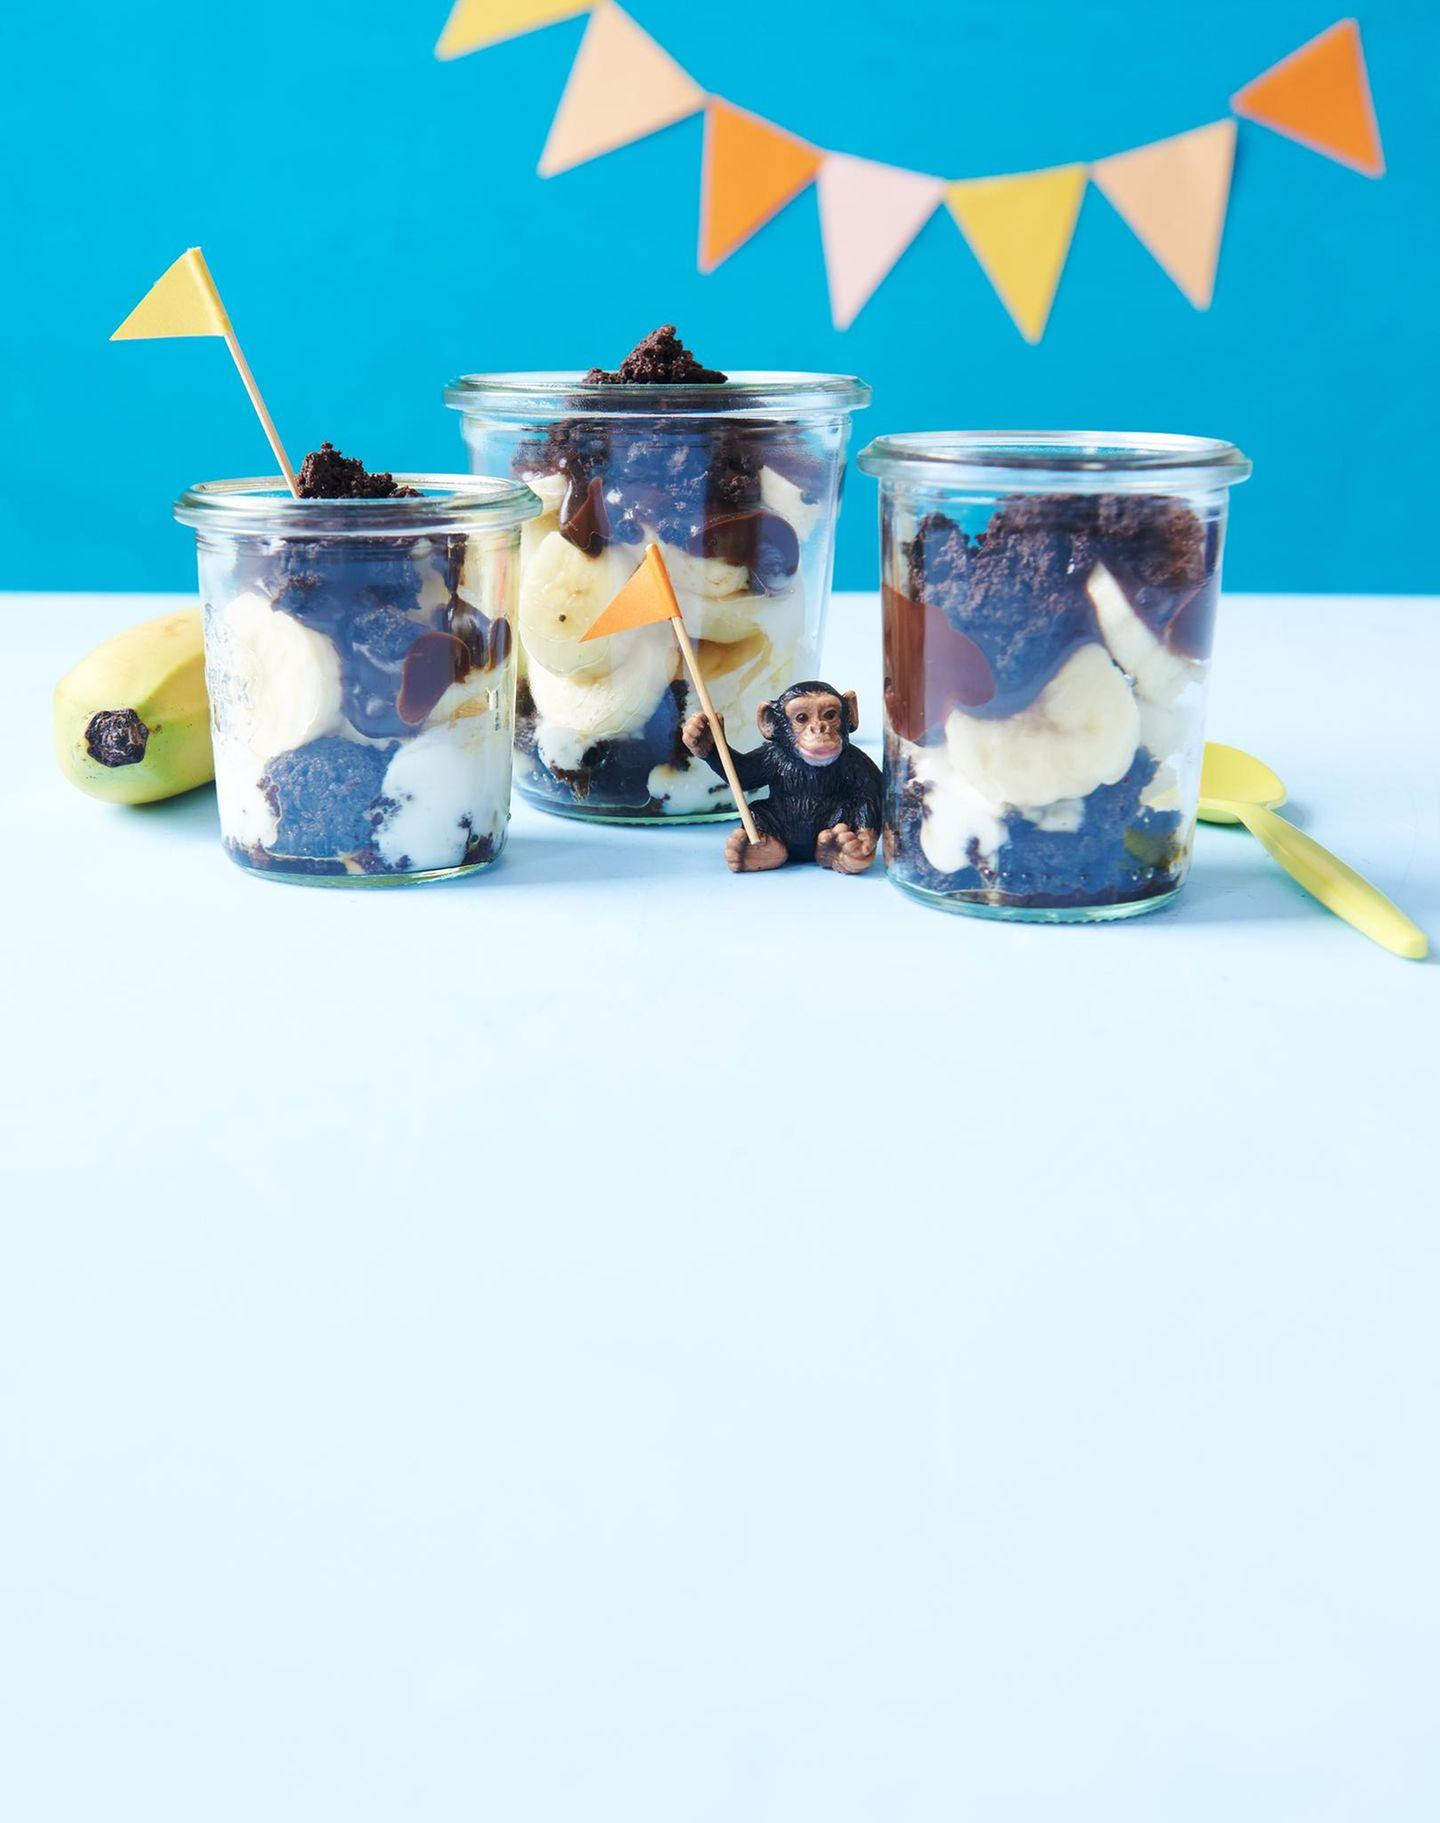 Drei Bananensplits im Glas